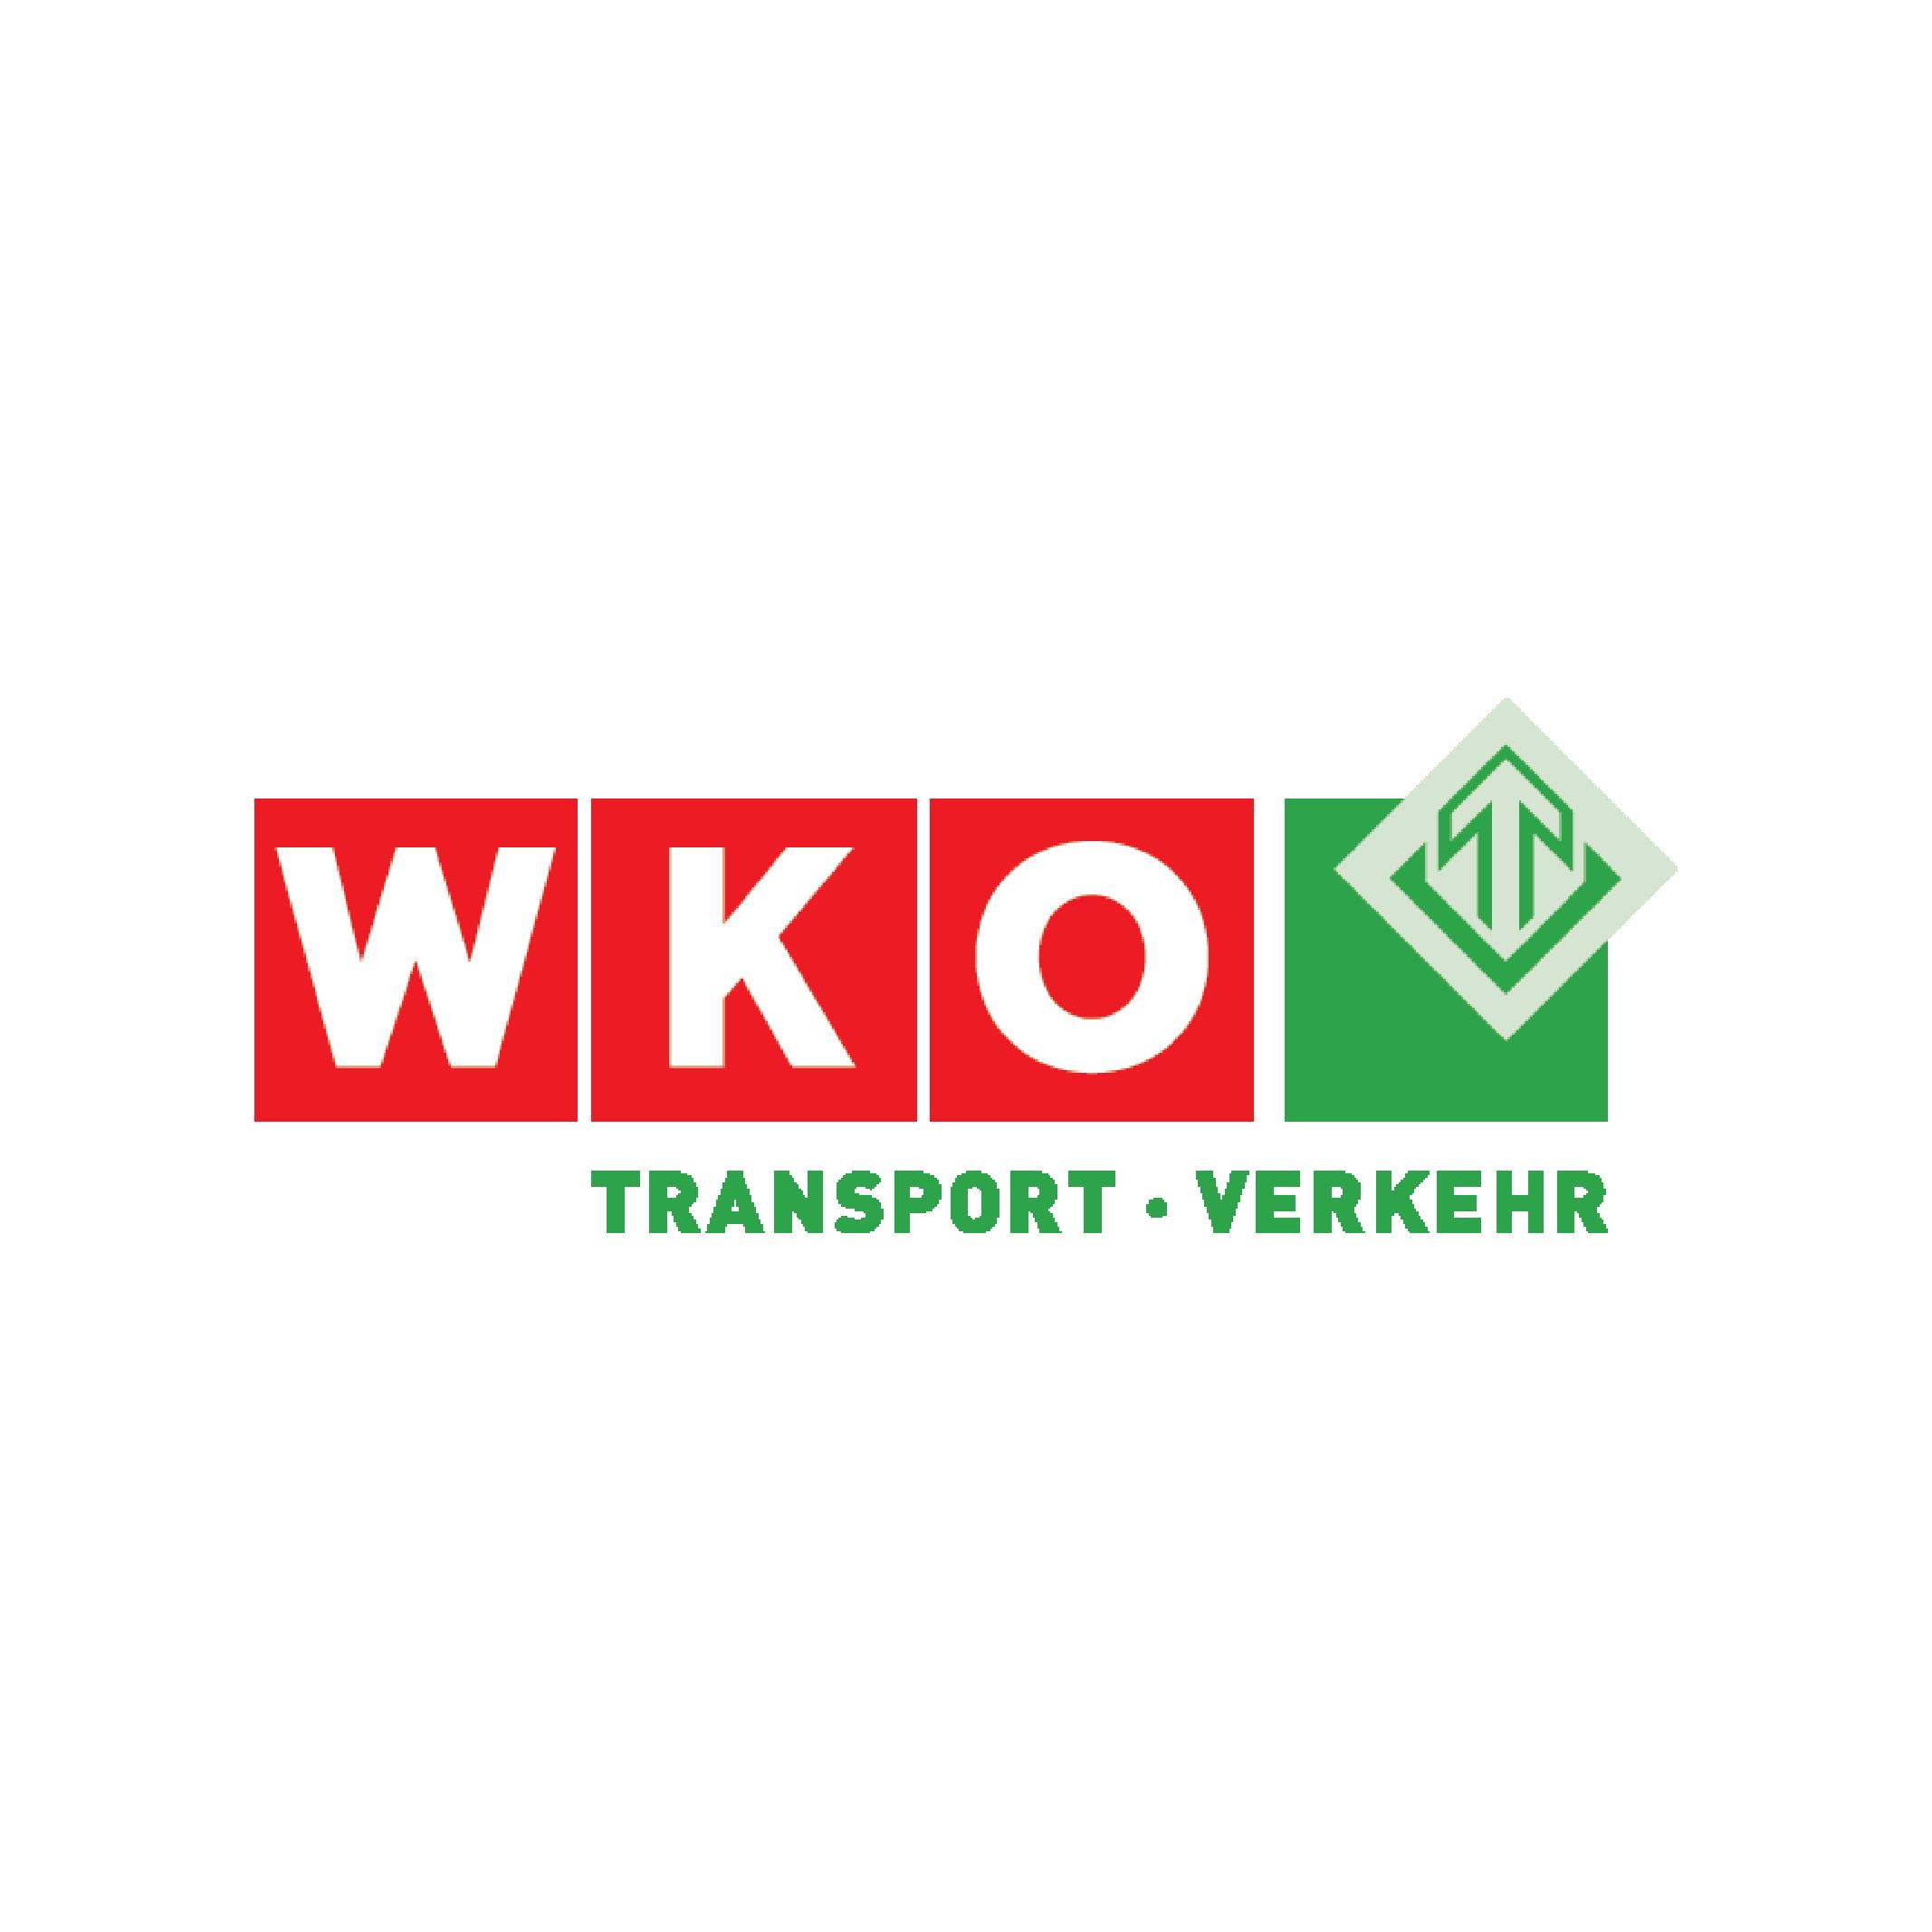 https://www.influxmediahouse.com/wp-content/uploads/2019/01/Logo_WKO-TV-colour.png